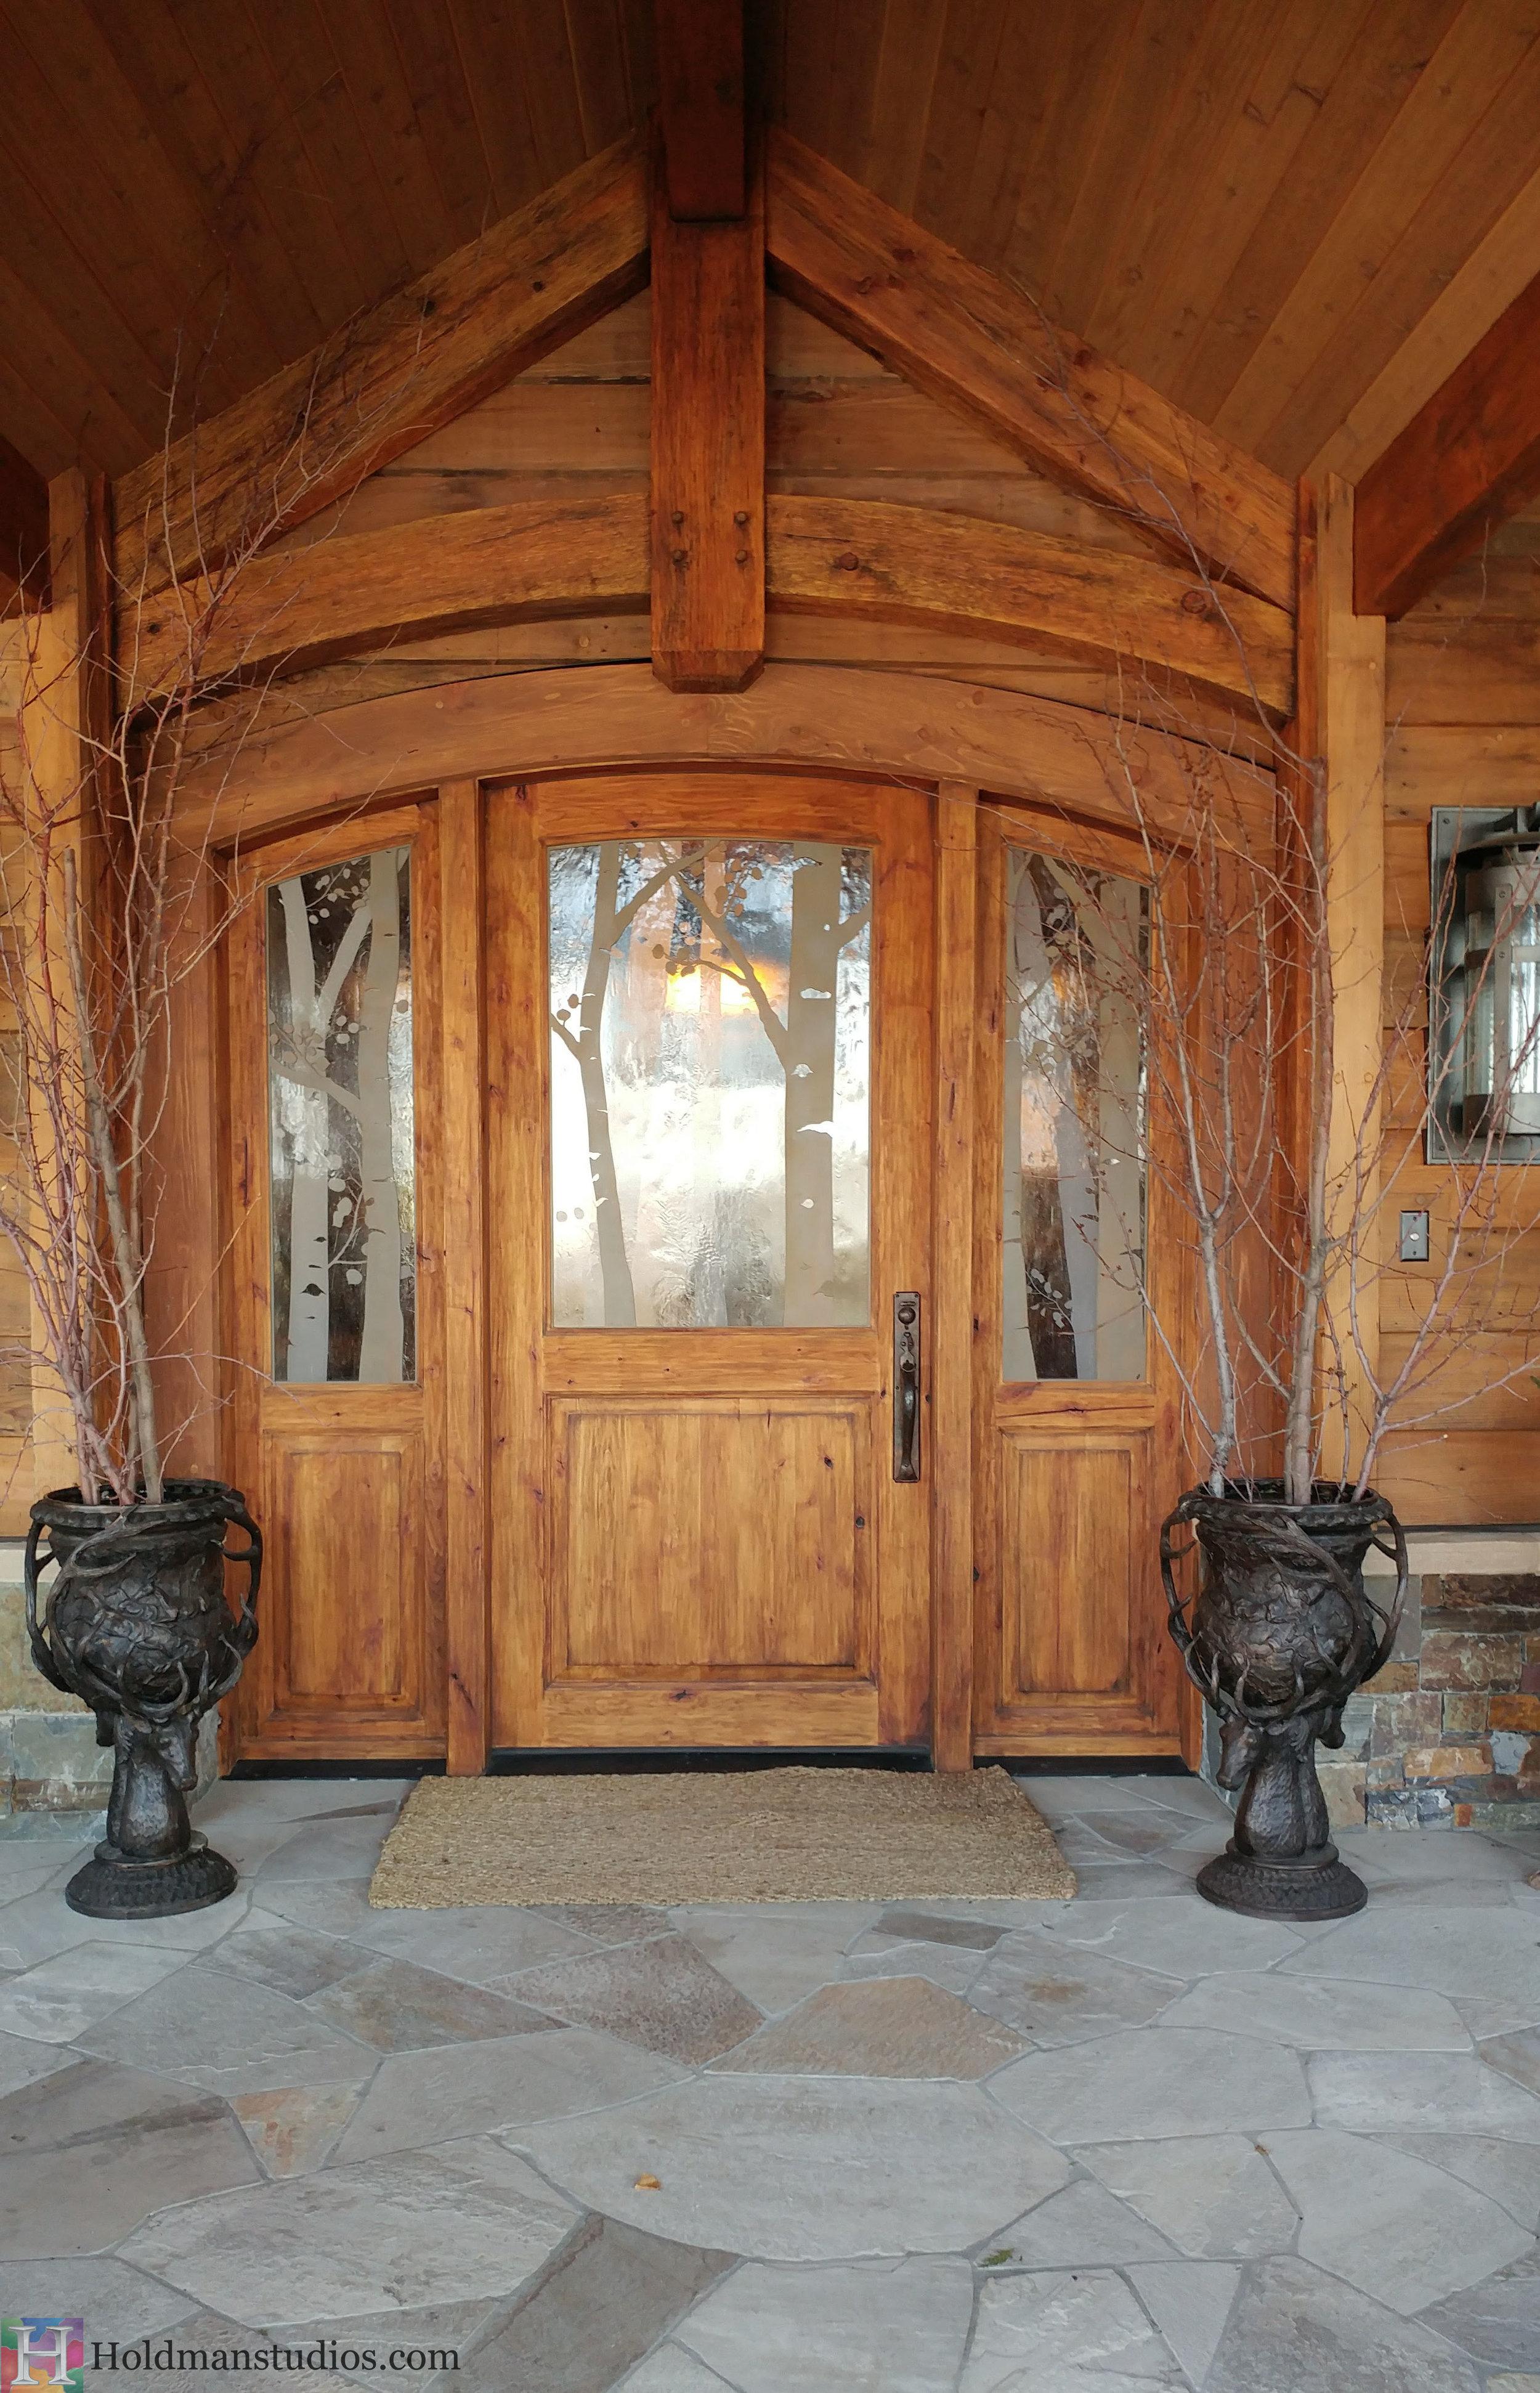 Holdman-studios-etched-art-glass-front-door-windows-aspen-trees-leaves-outside.jpg